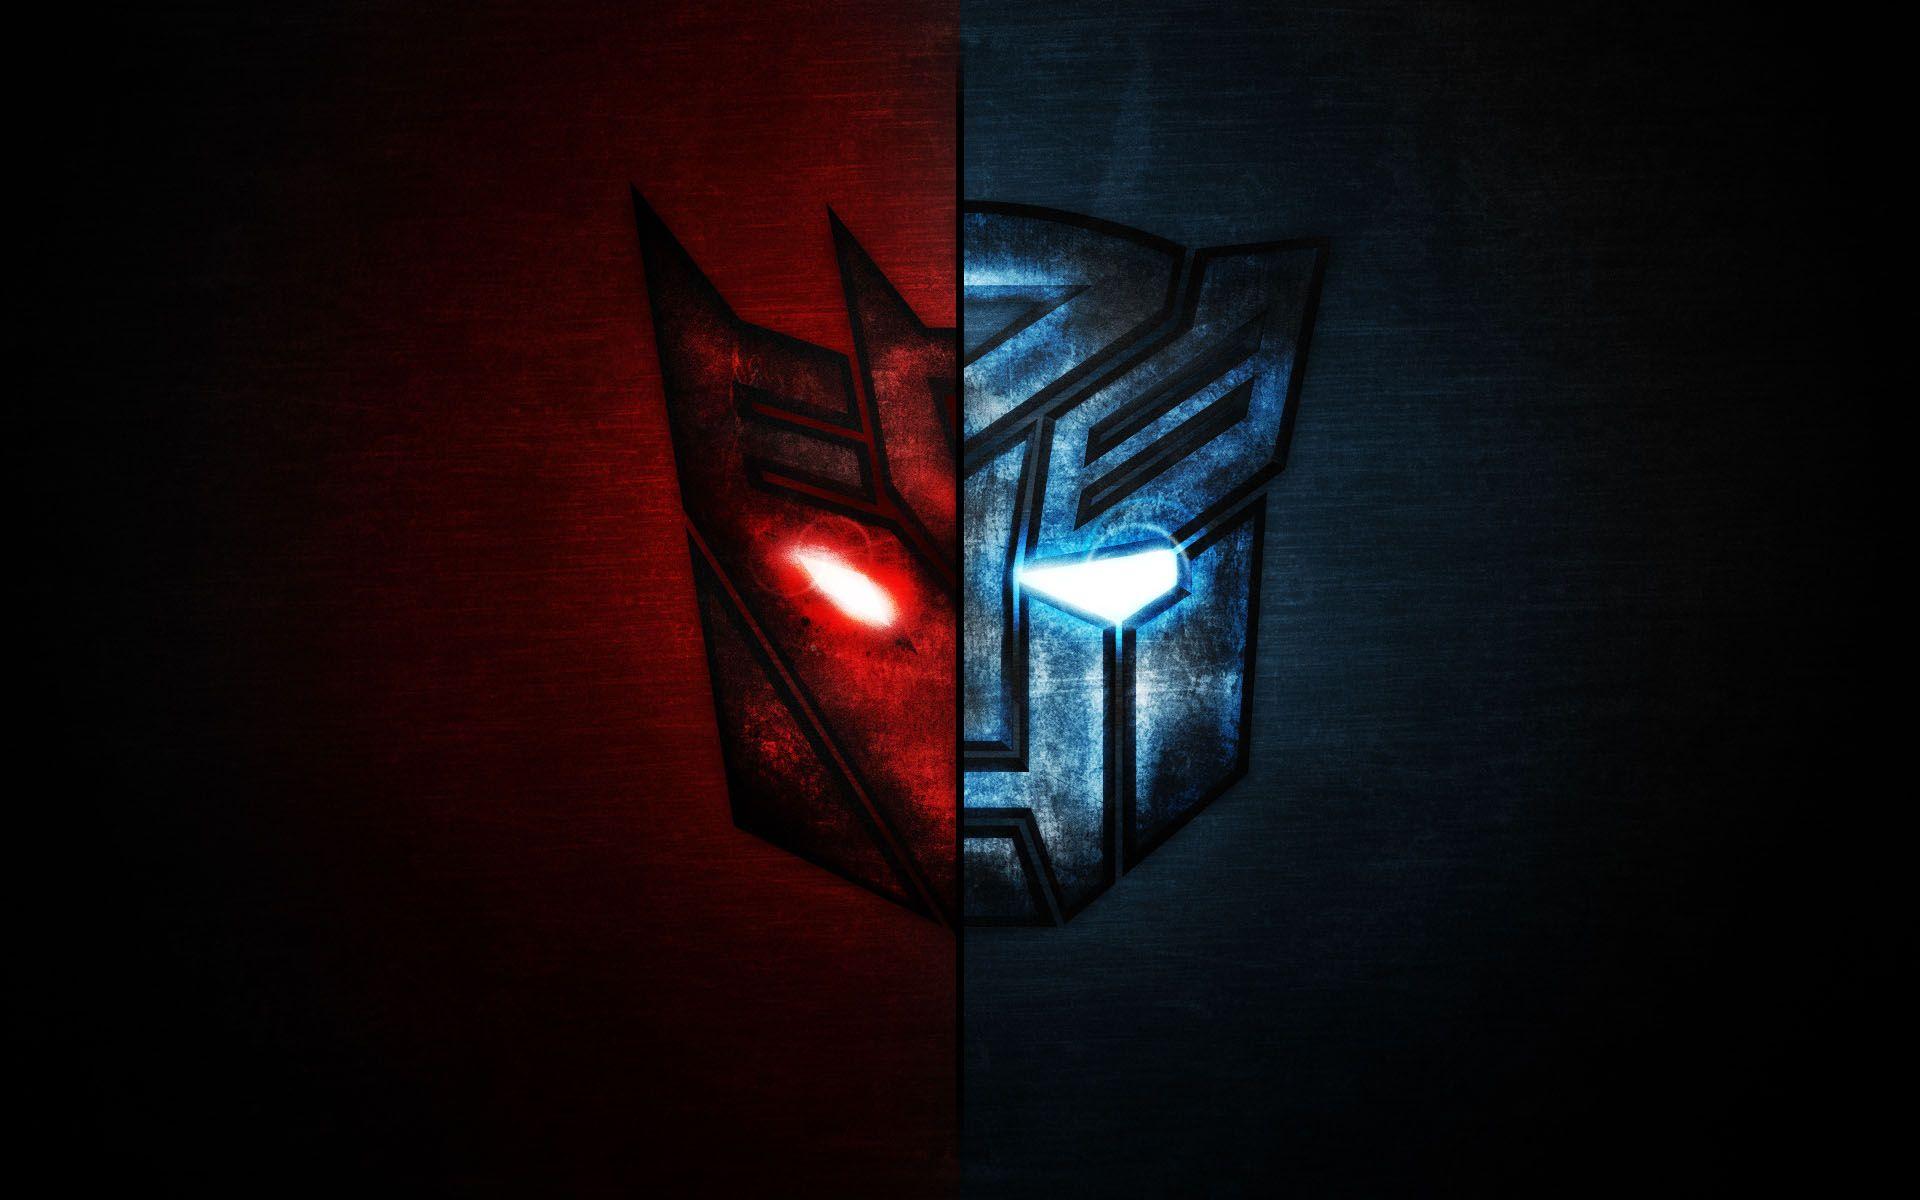 Autobot Vs Decepticon Transformer Logo Wallpaper Hd Wallpaper